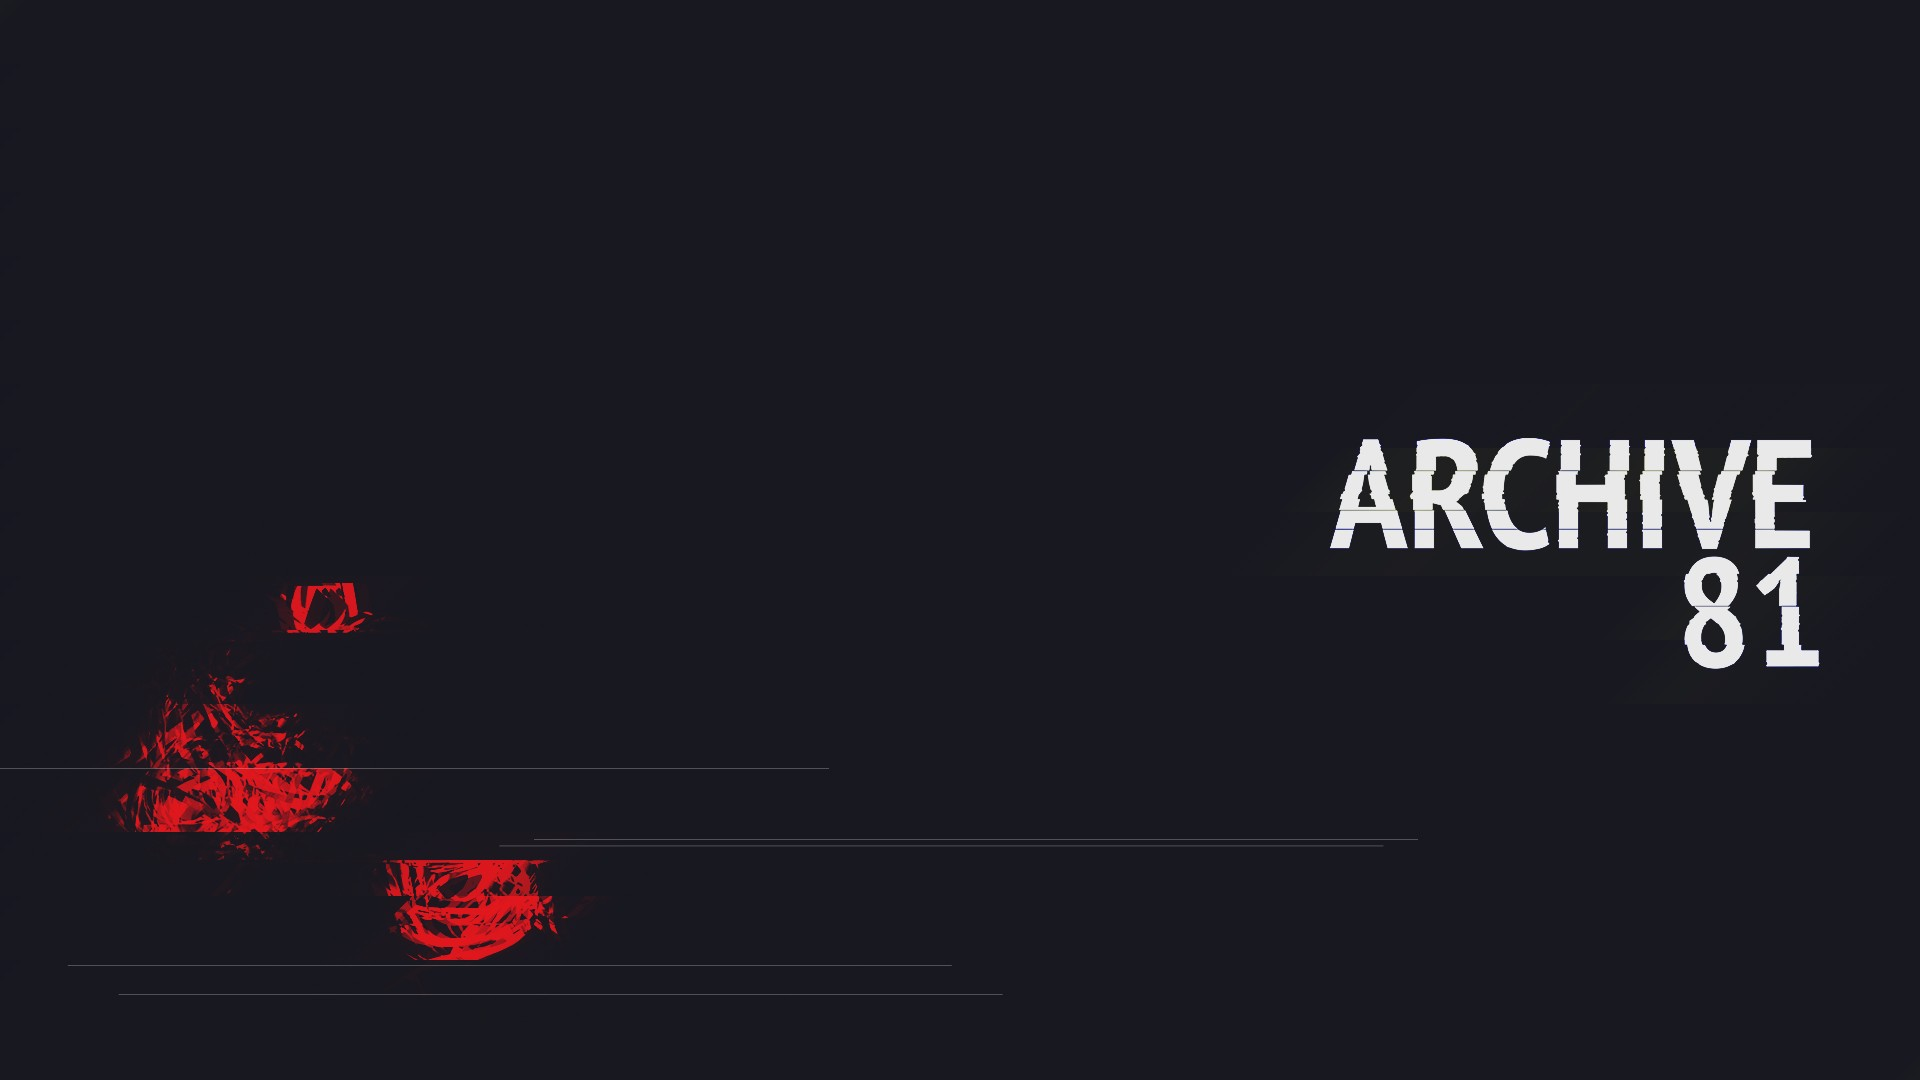 Netflix'in yeni korku dizisi: Archive 81